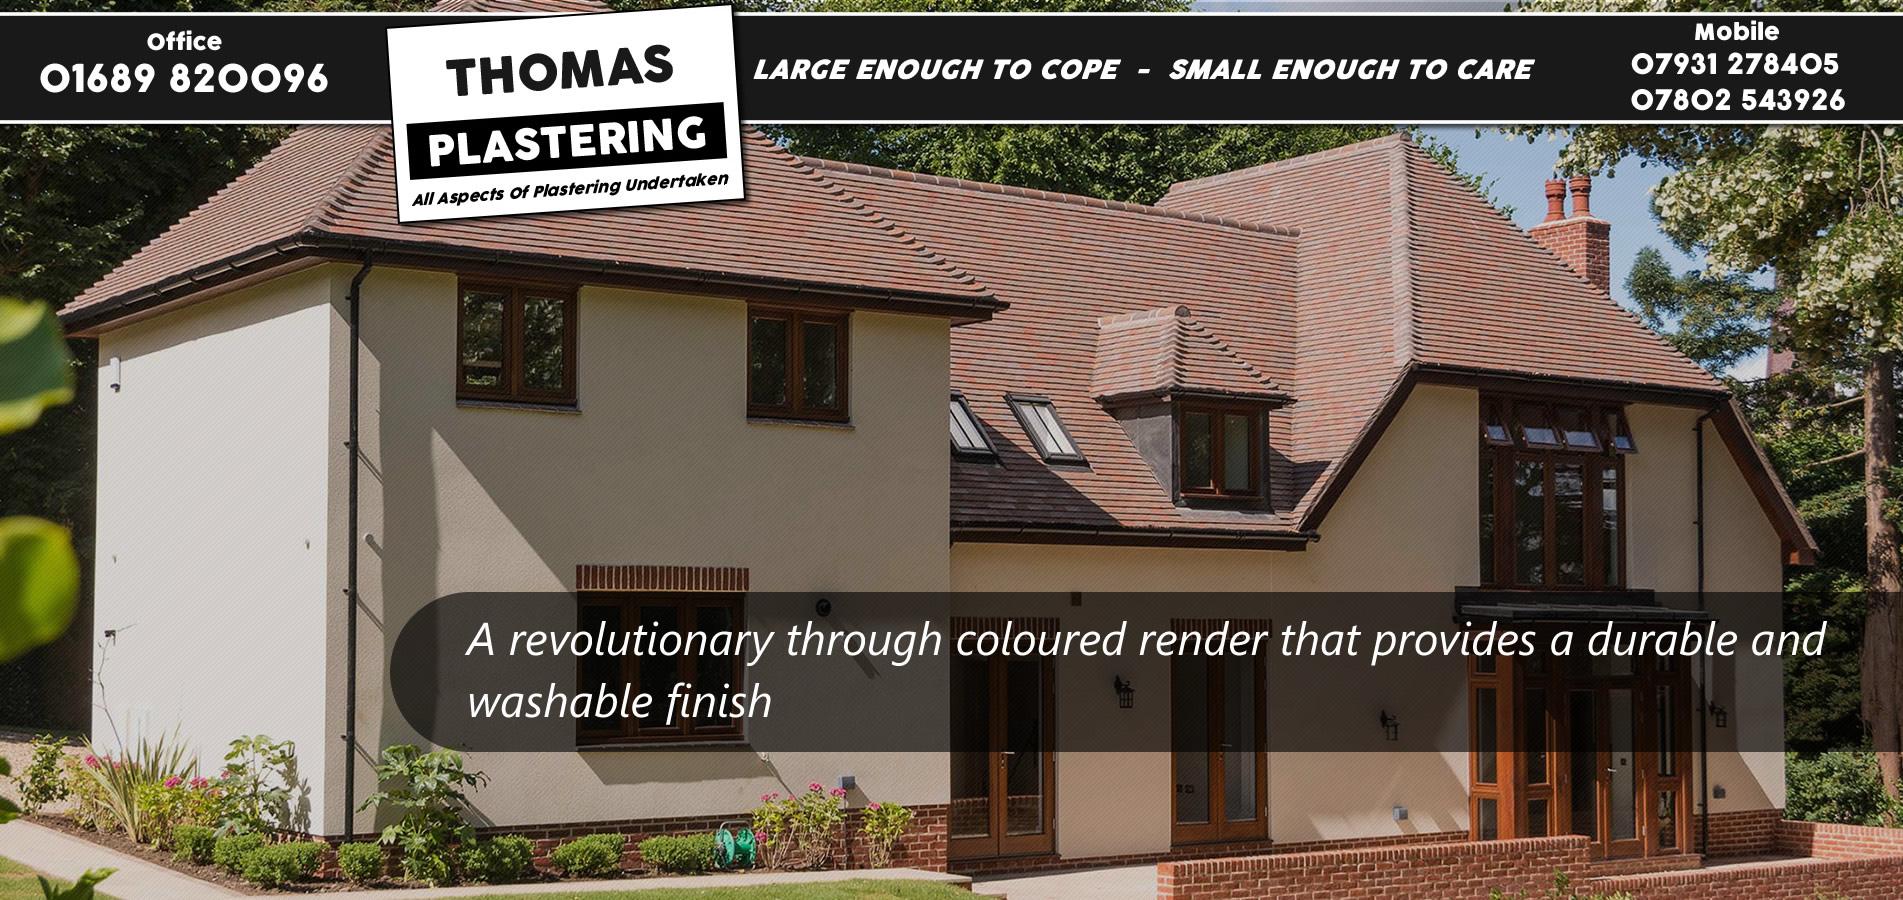 plasterers plastering services